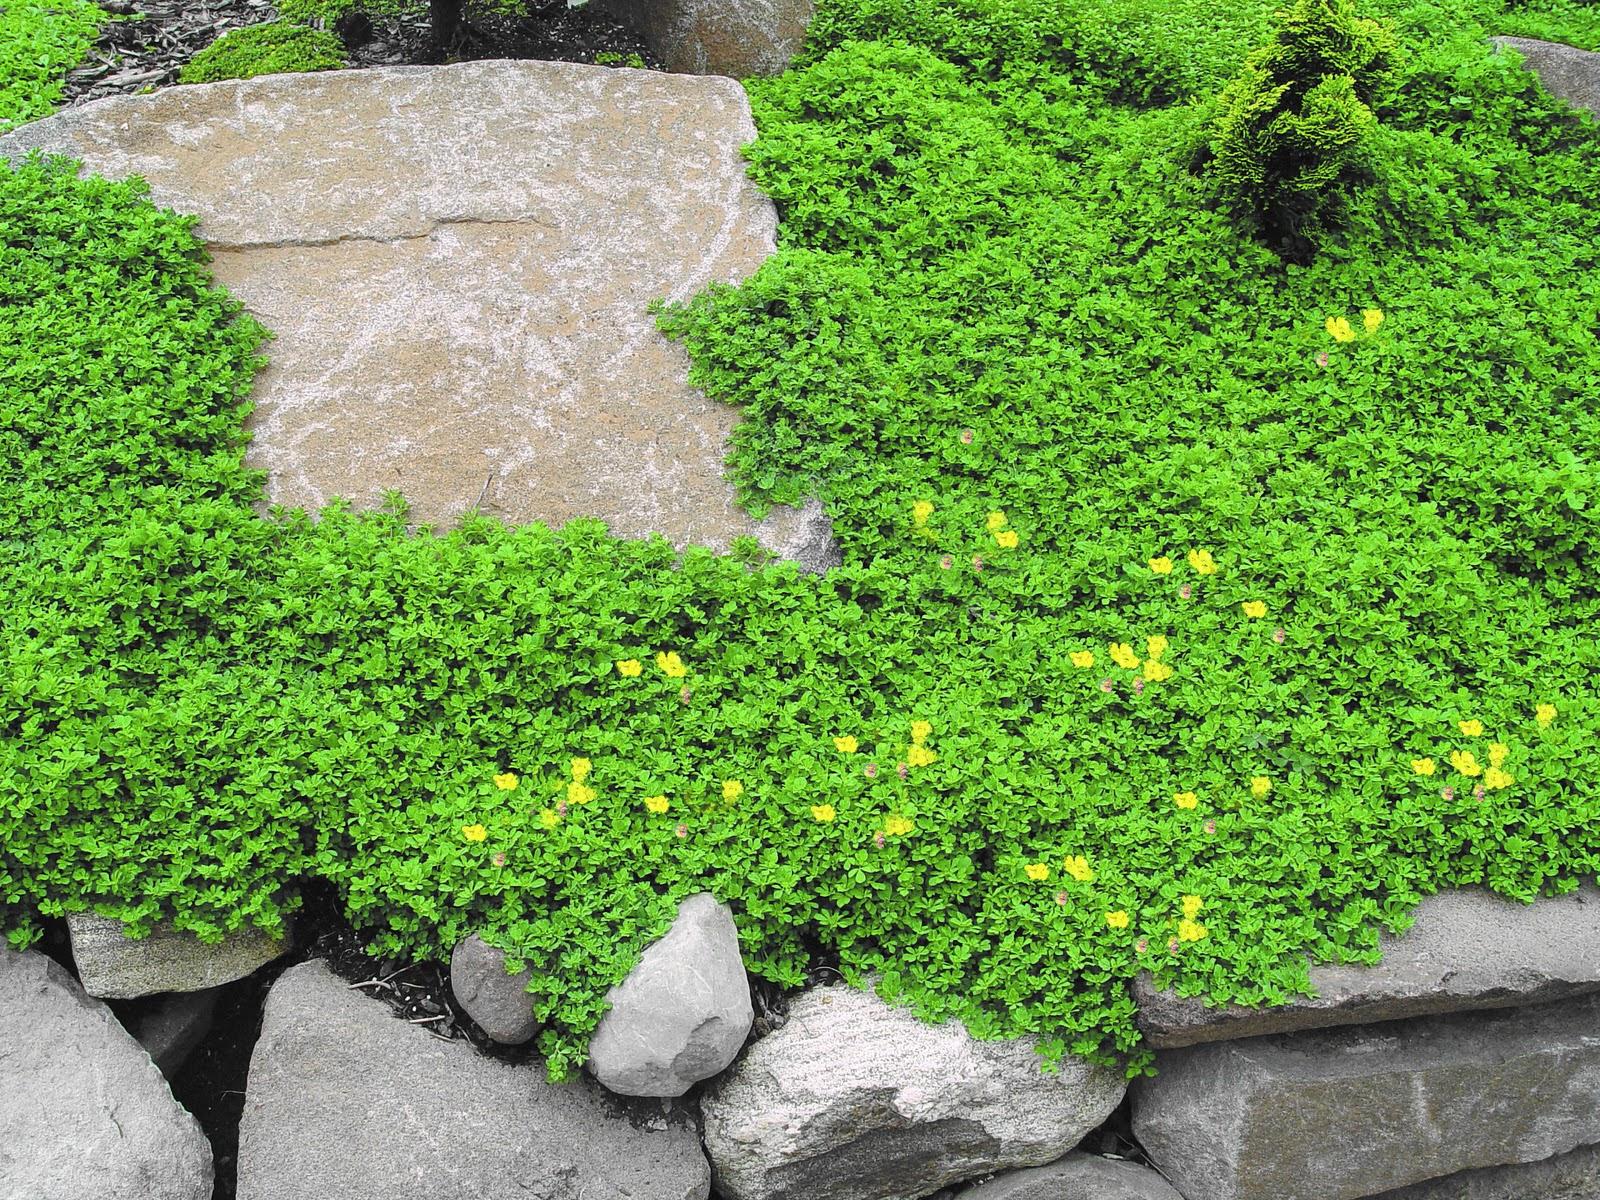 arte y jardiner a plantas tapizantes On plantas tapizantes